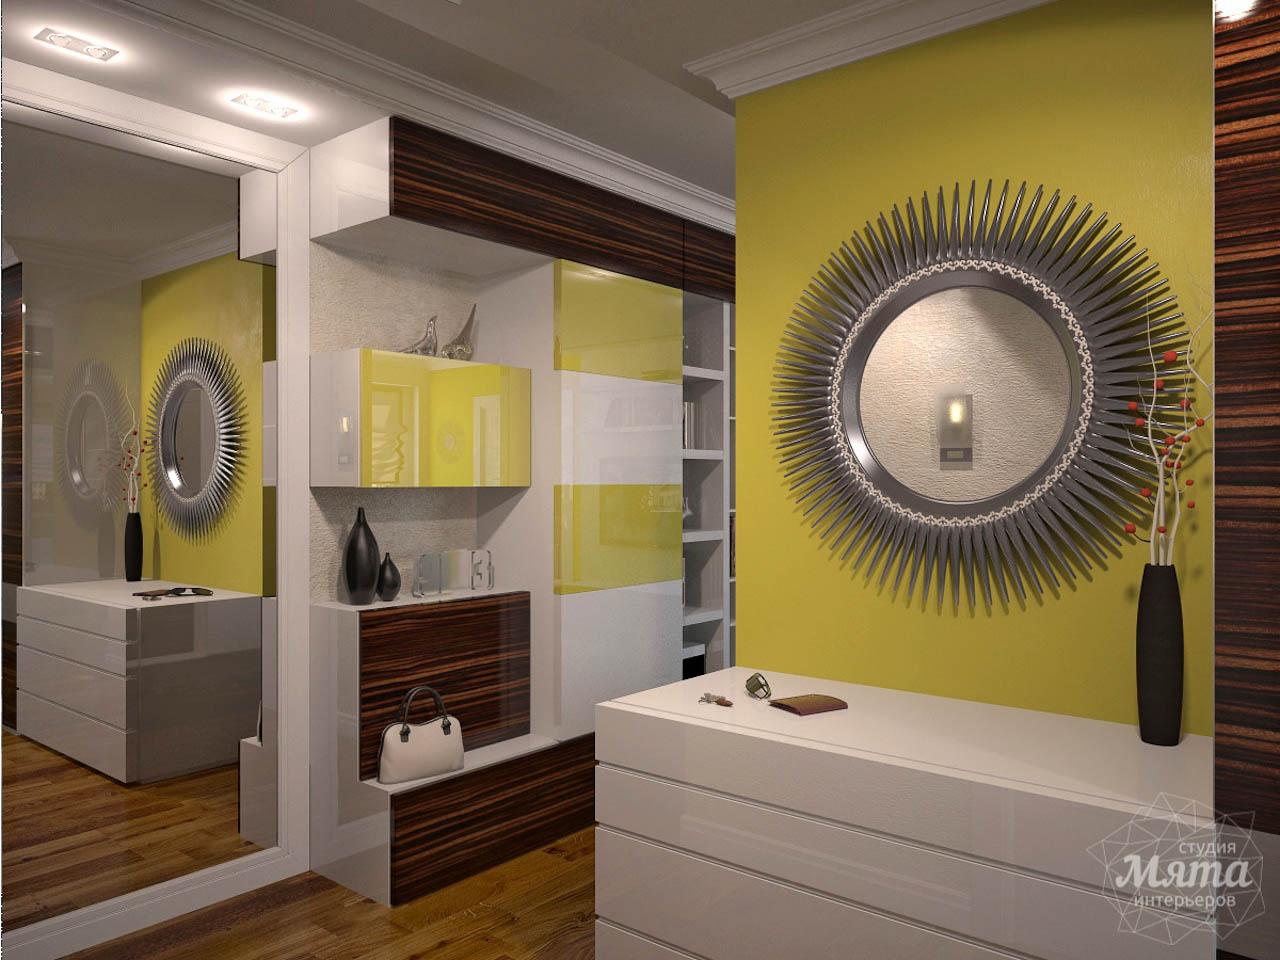 Дизайн интерьера двухкомнатной квартиры по ул. Комсомольская 14 img523857472